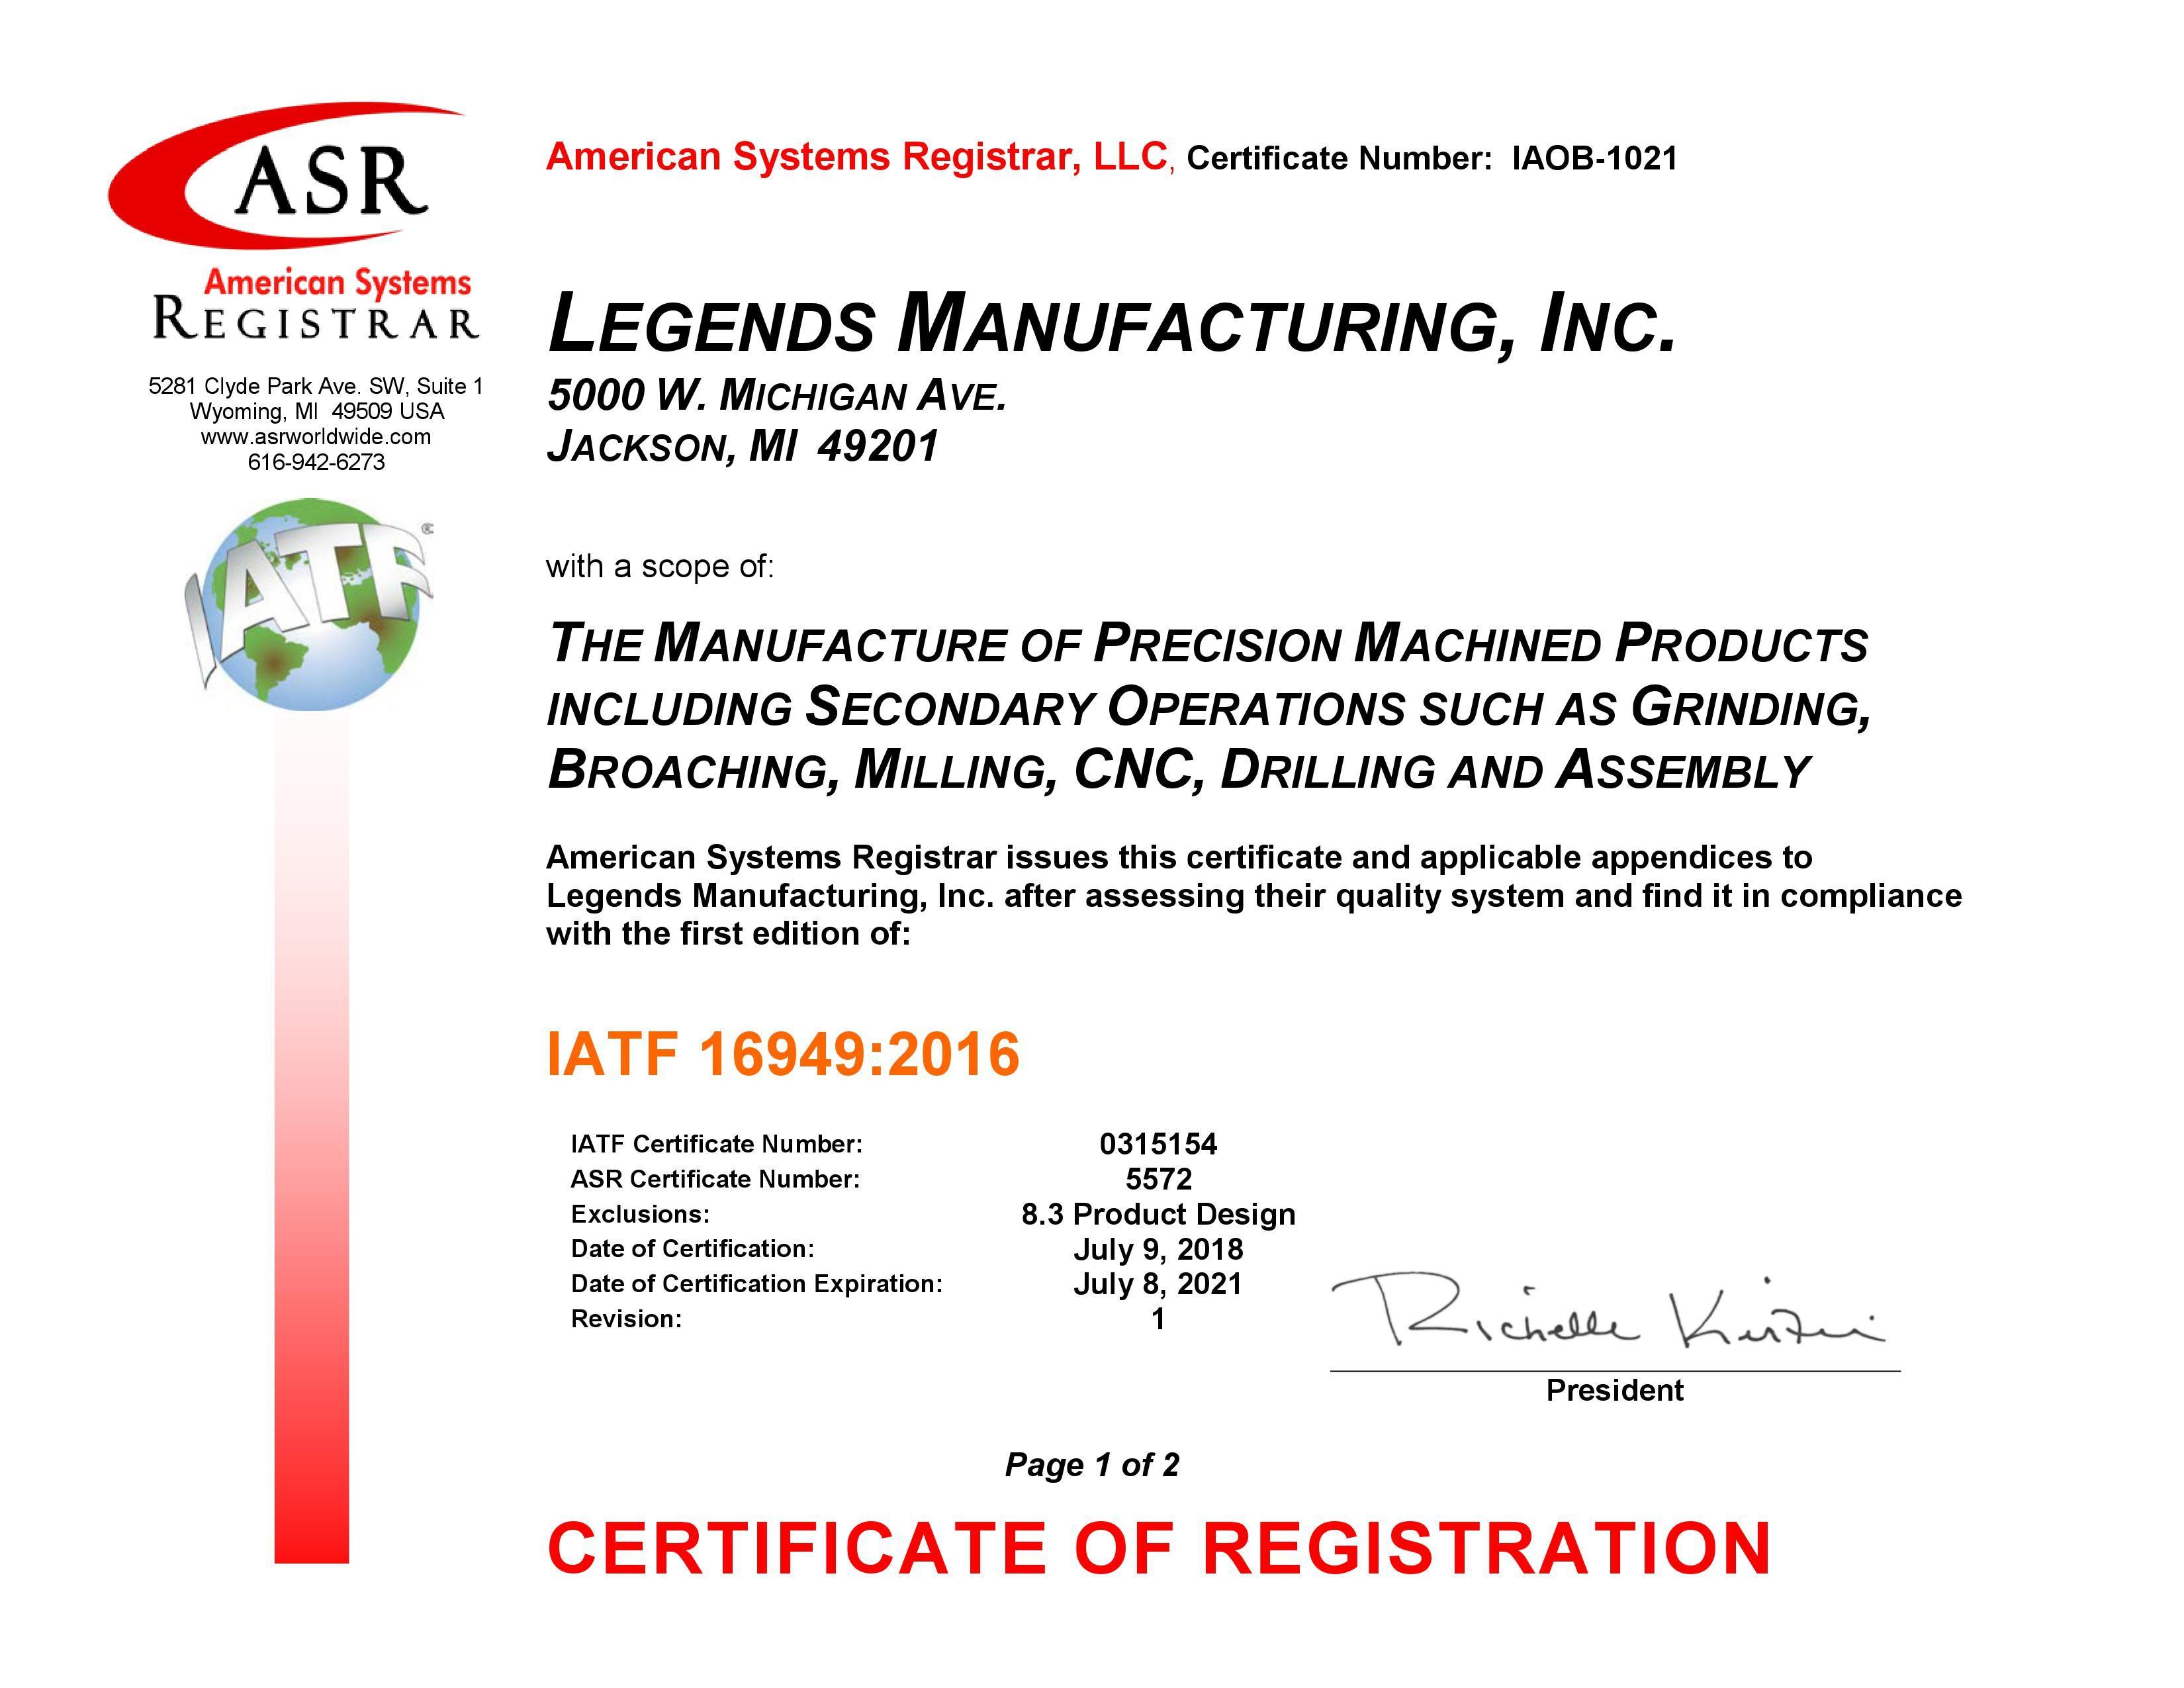 Legends Manufacturing IATF 16949 Certificate Front